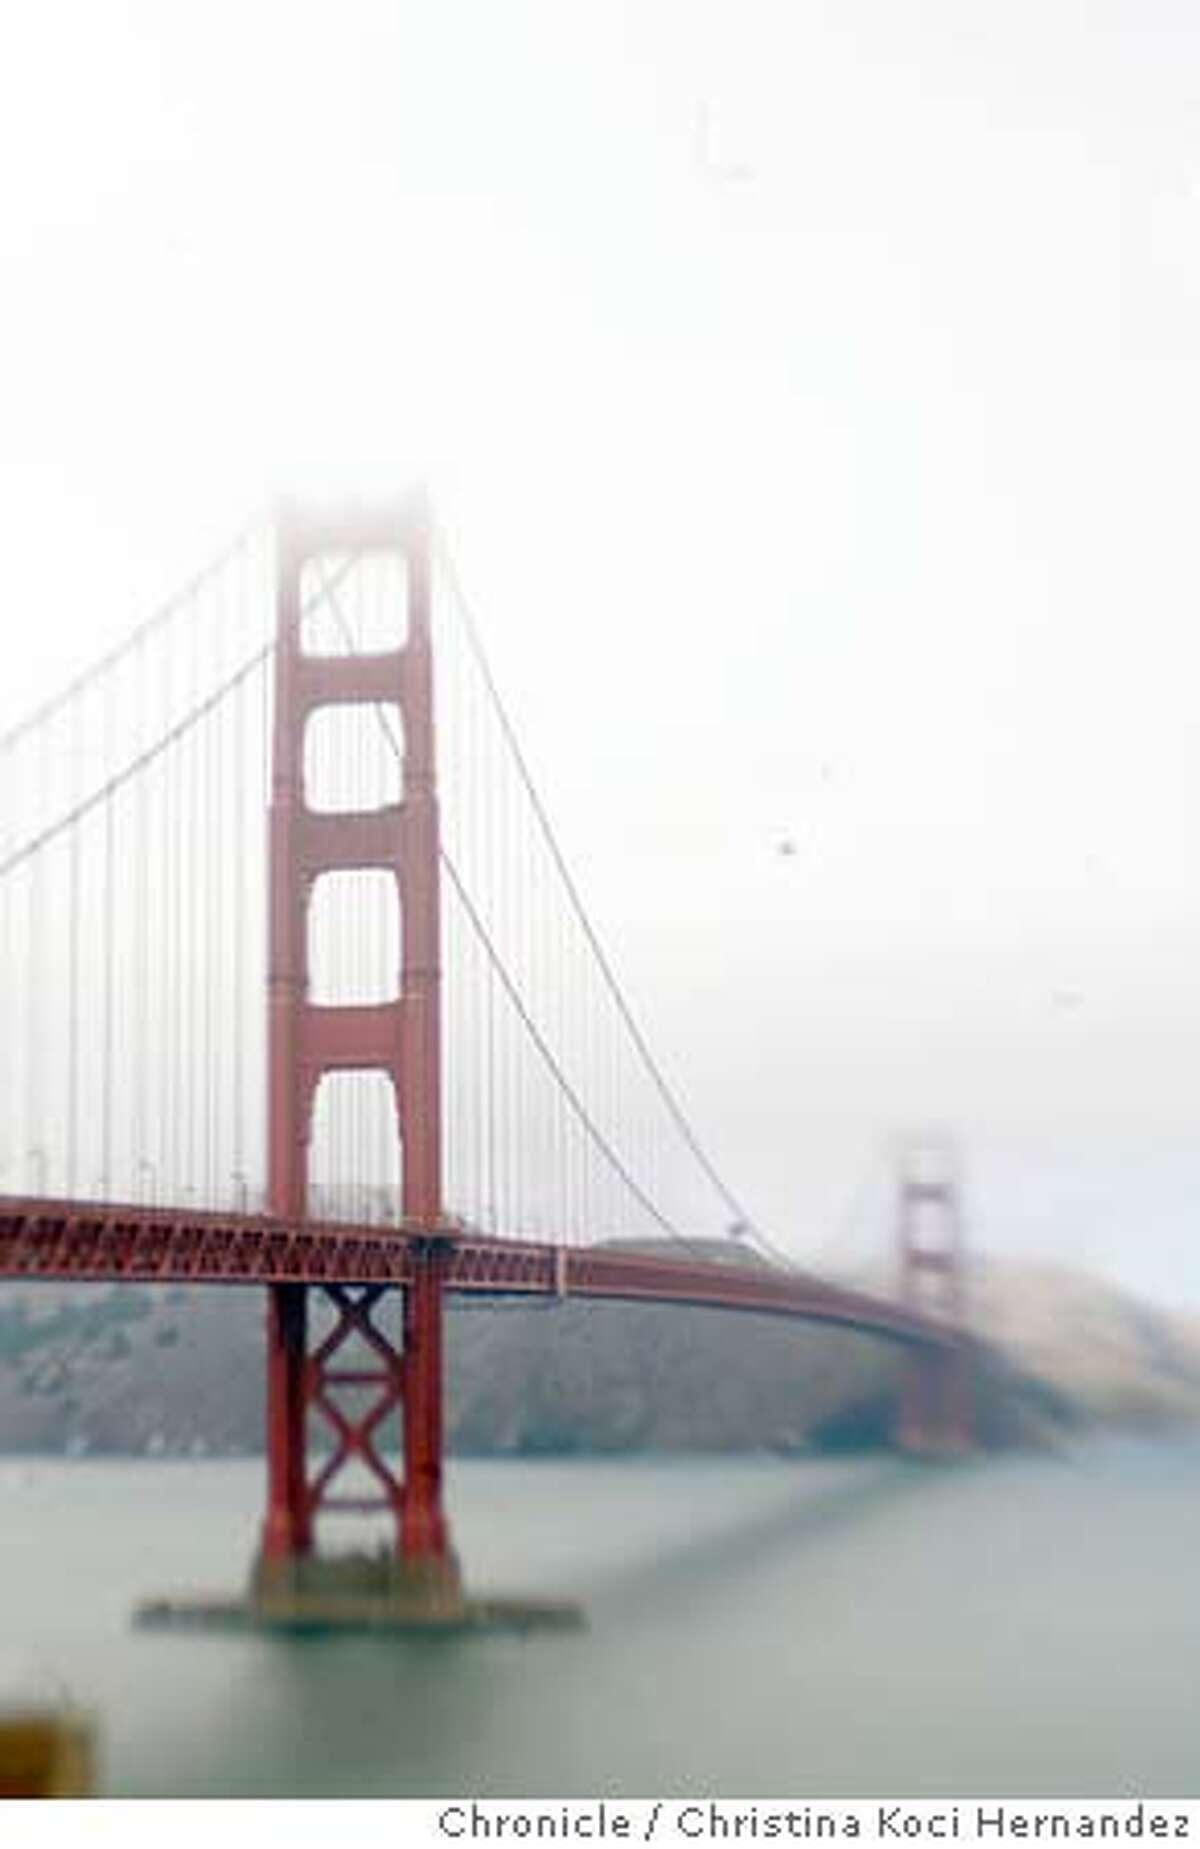 CHRISTINA KOCI HERNANDEZ/CHRONICLE Photos of the Golden gate Bridge. Story on GG Bridge suicides for story,